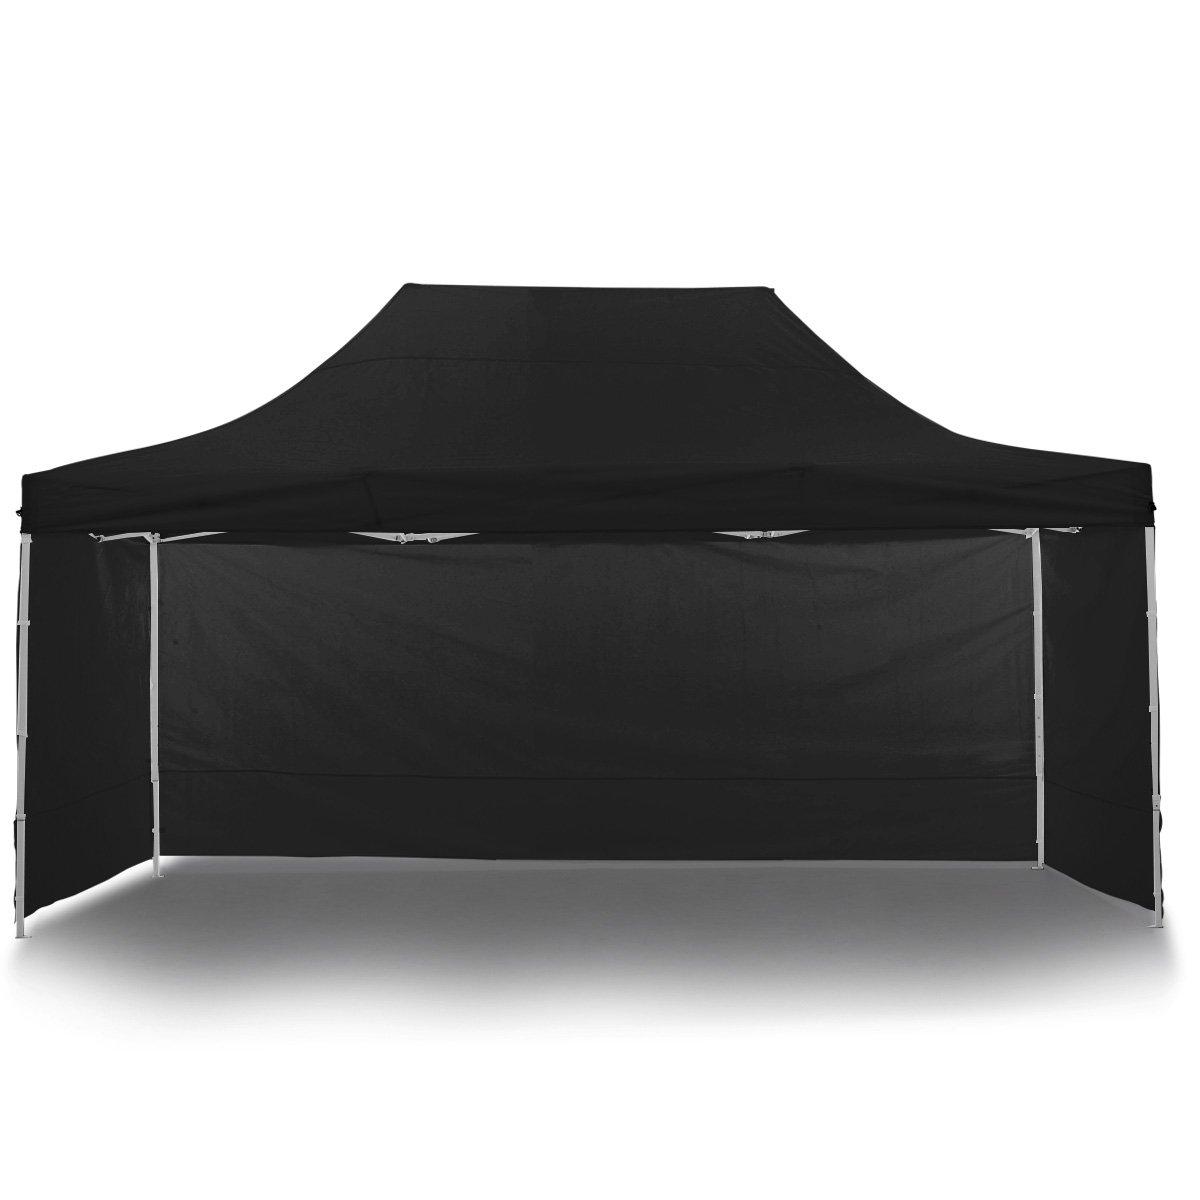 Gazebo Tent Marquee 3x4.5m PopUp Outdoor Wallaroo Black